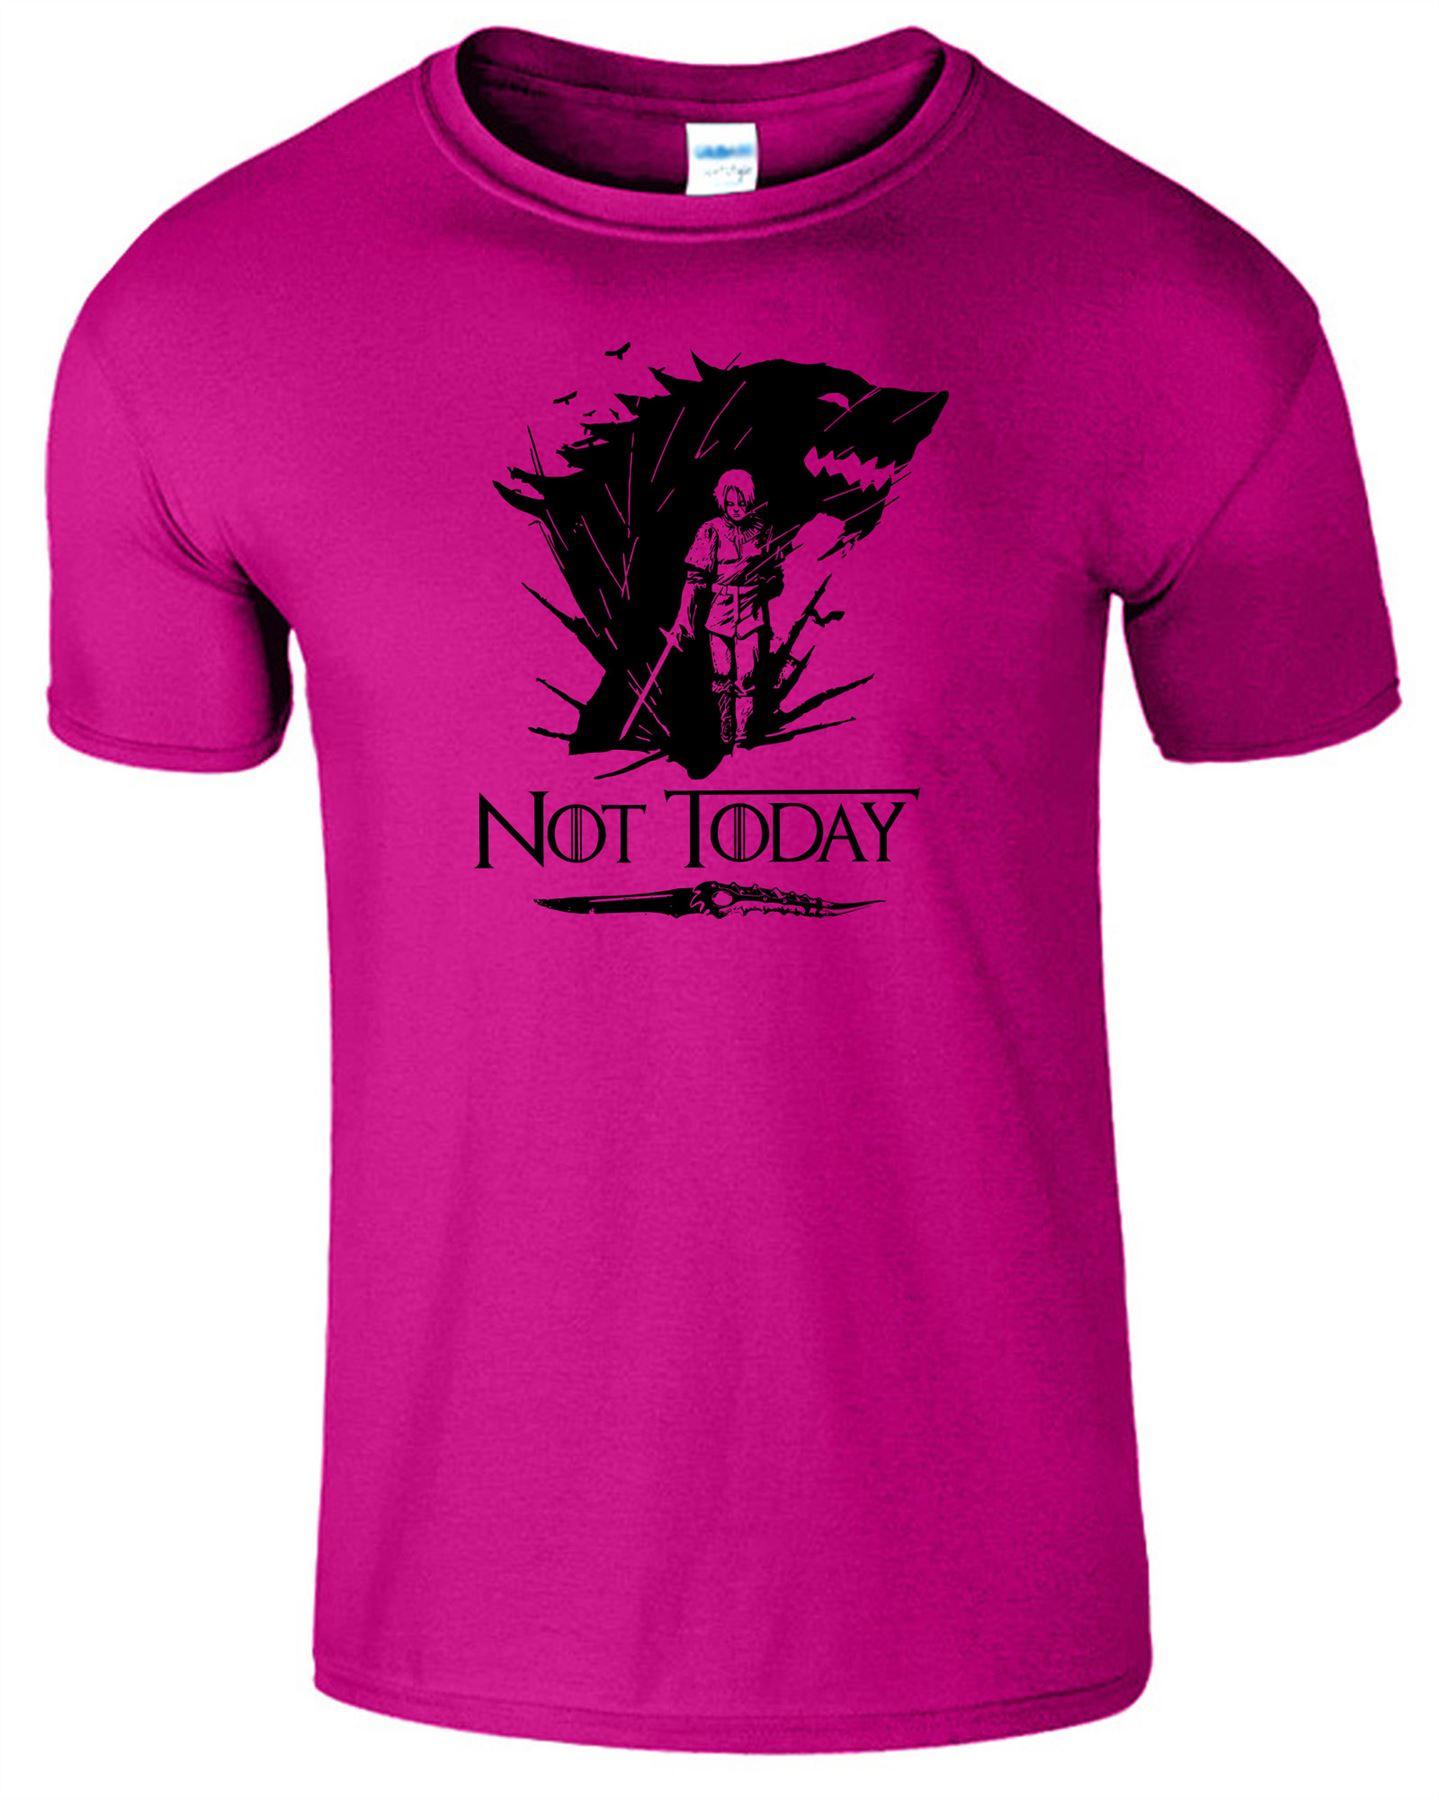 Arya-Stark-Not-Today-T-Shirt-Mens-Game-Season-Womens-Shirt-Adults-Unisex-Fit Indexbild 21